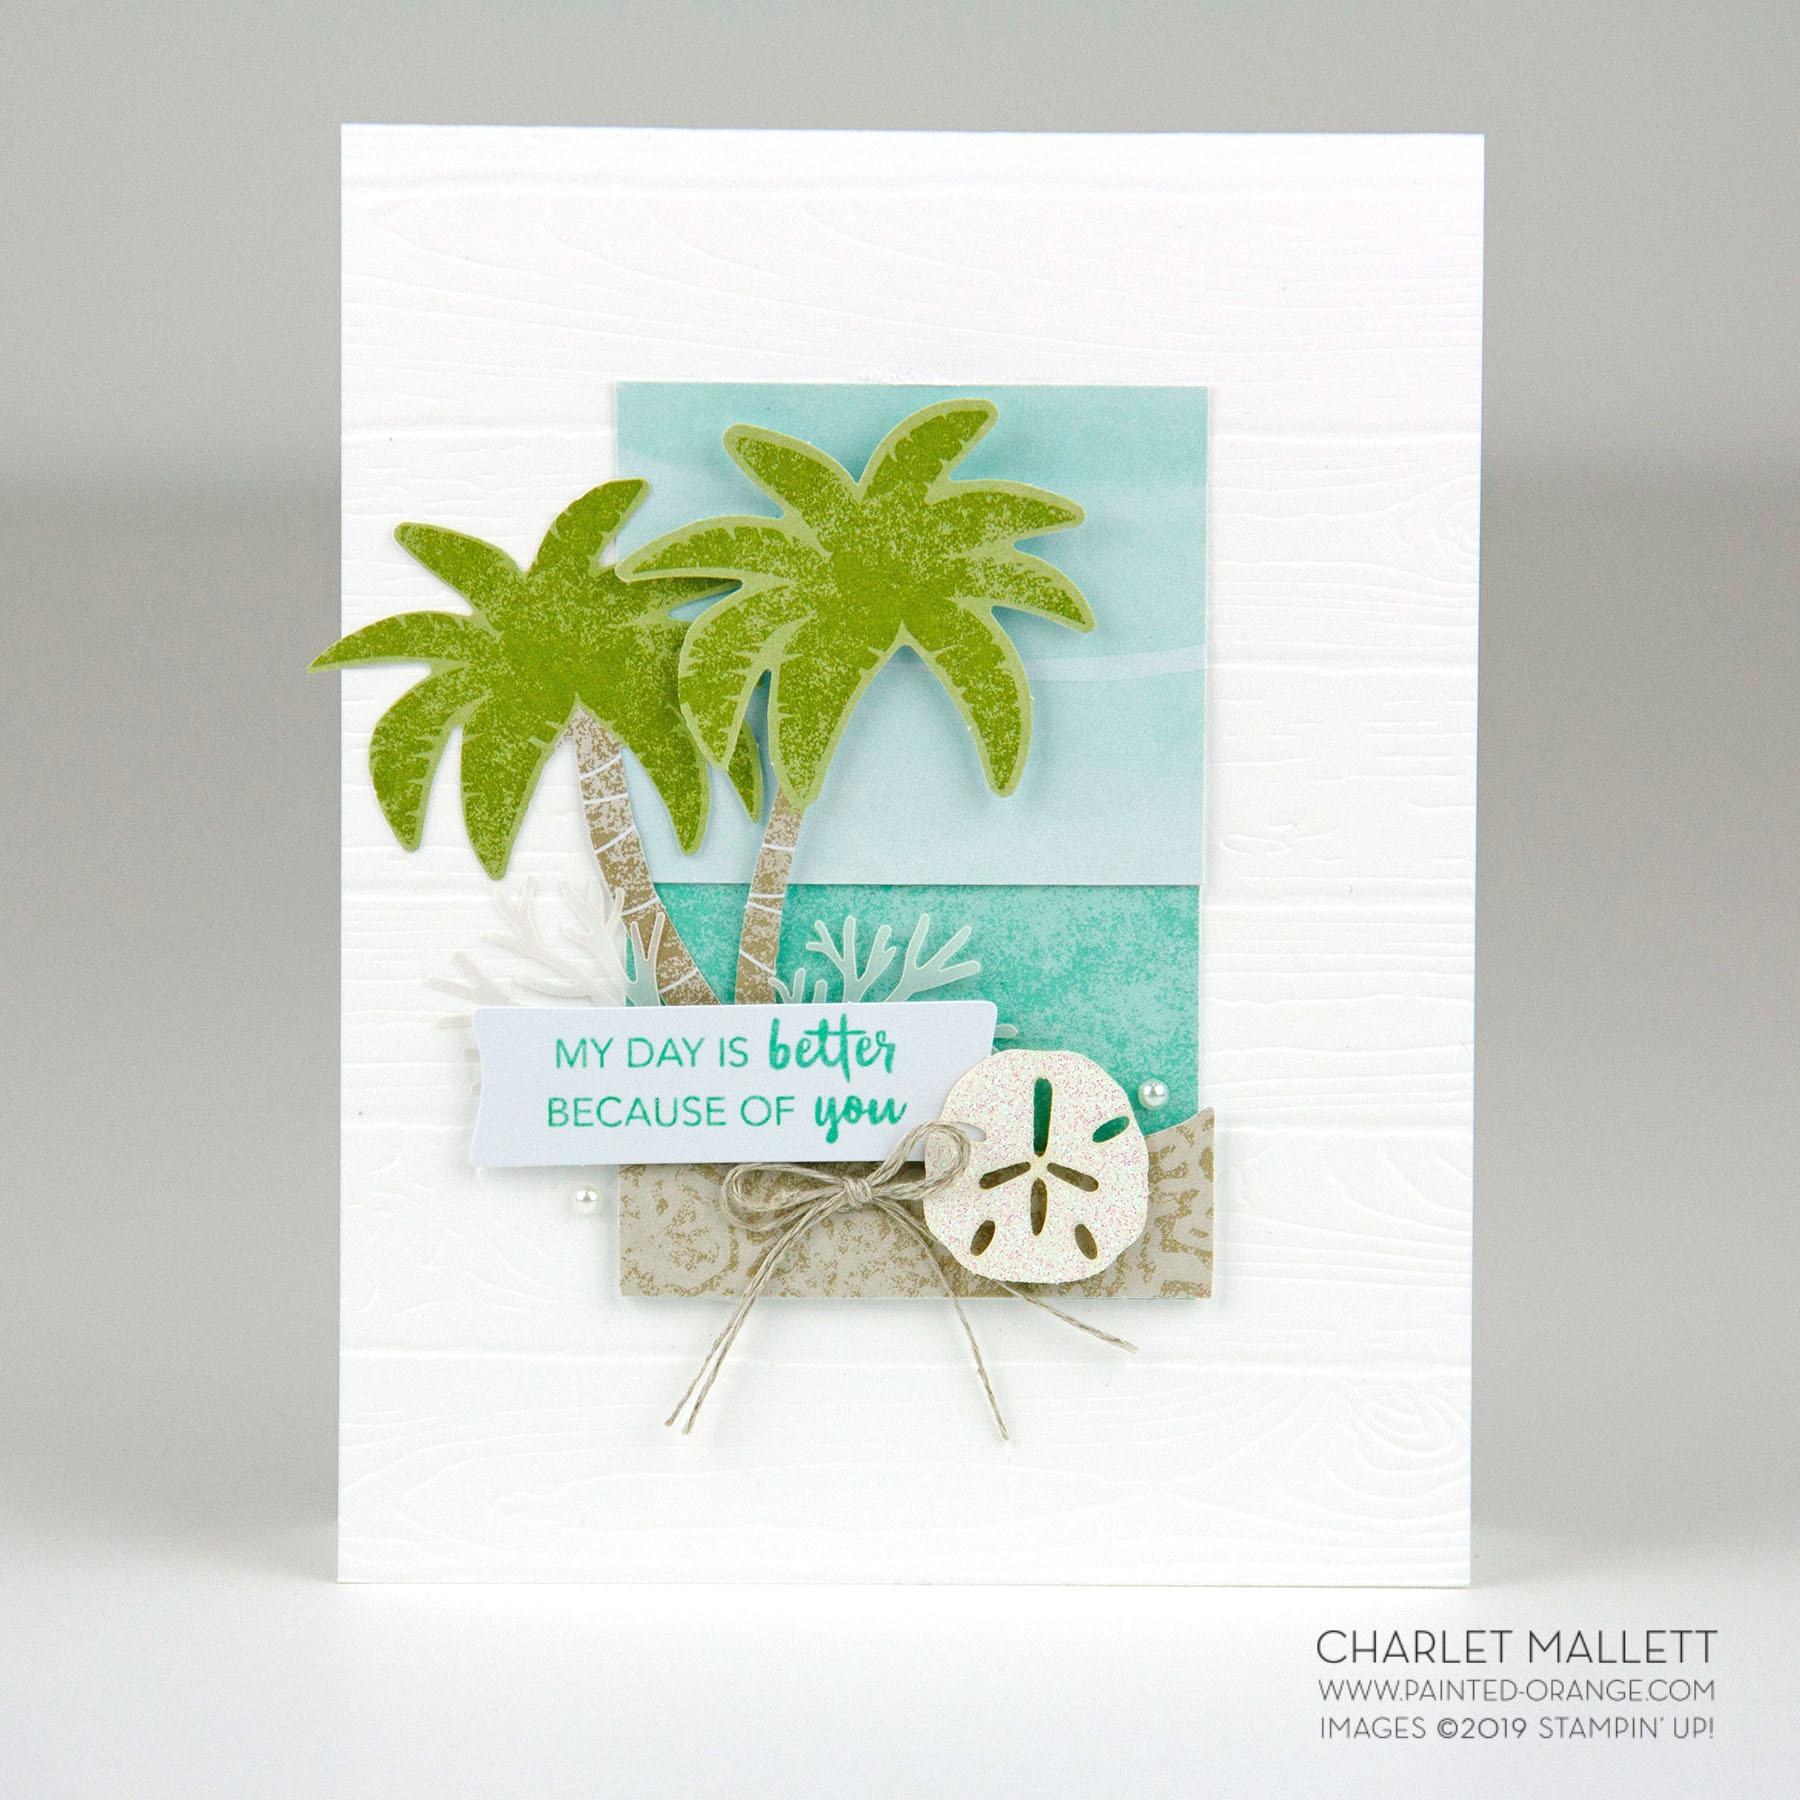 A Little Smile - Paper Pumpkin Alternates, Charlet Mallett - Stampin' Up!